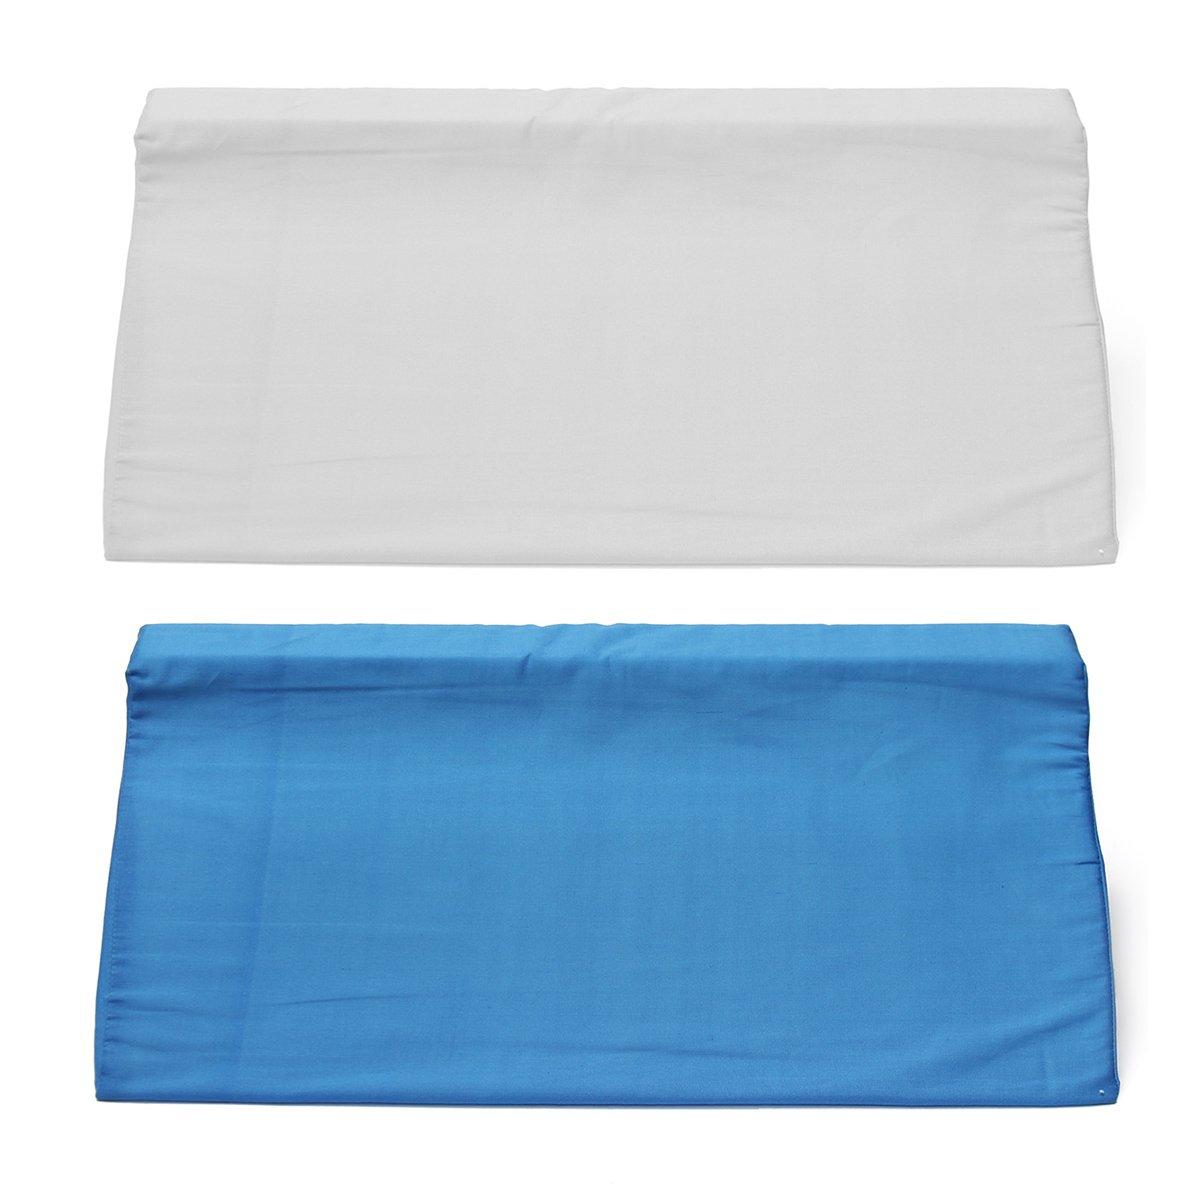 Azul EsportsMJJ /Ácido Reflujo Espuma Cama Cu/ña Almohada Pierna Elevaci/ón Respaldo Lumbar Cojines